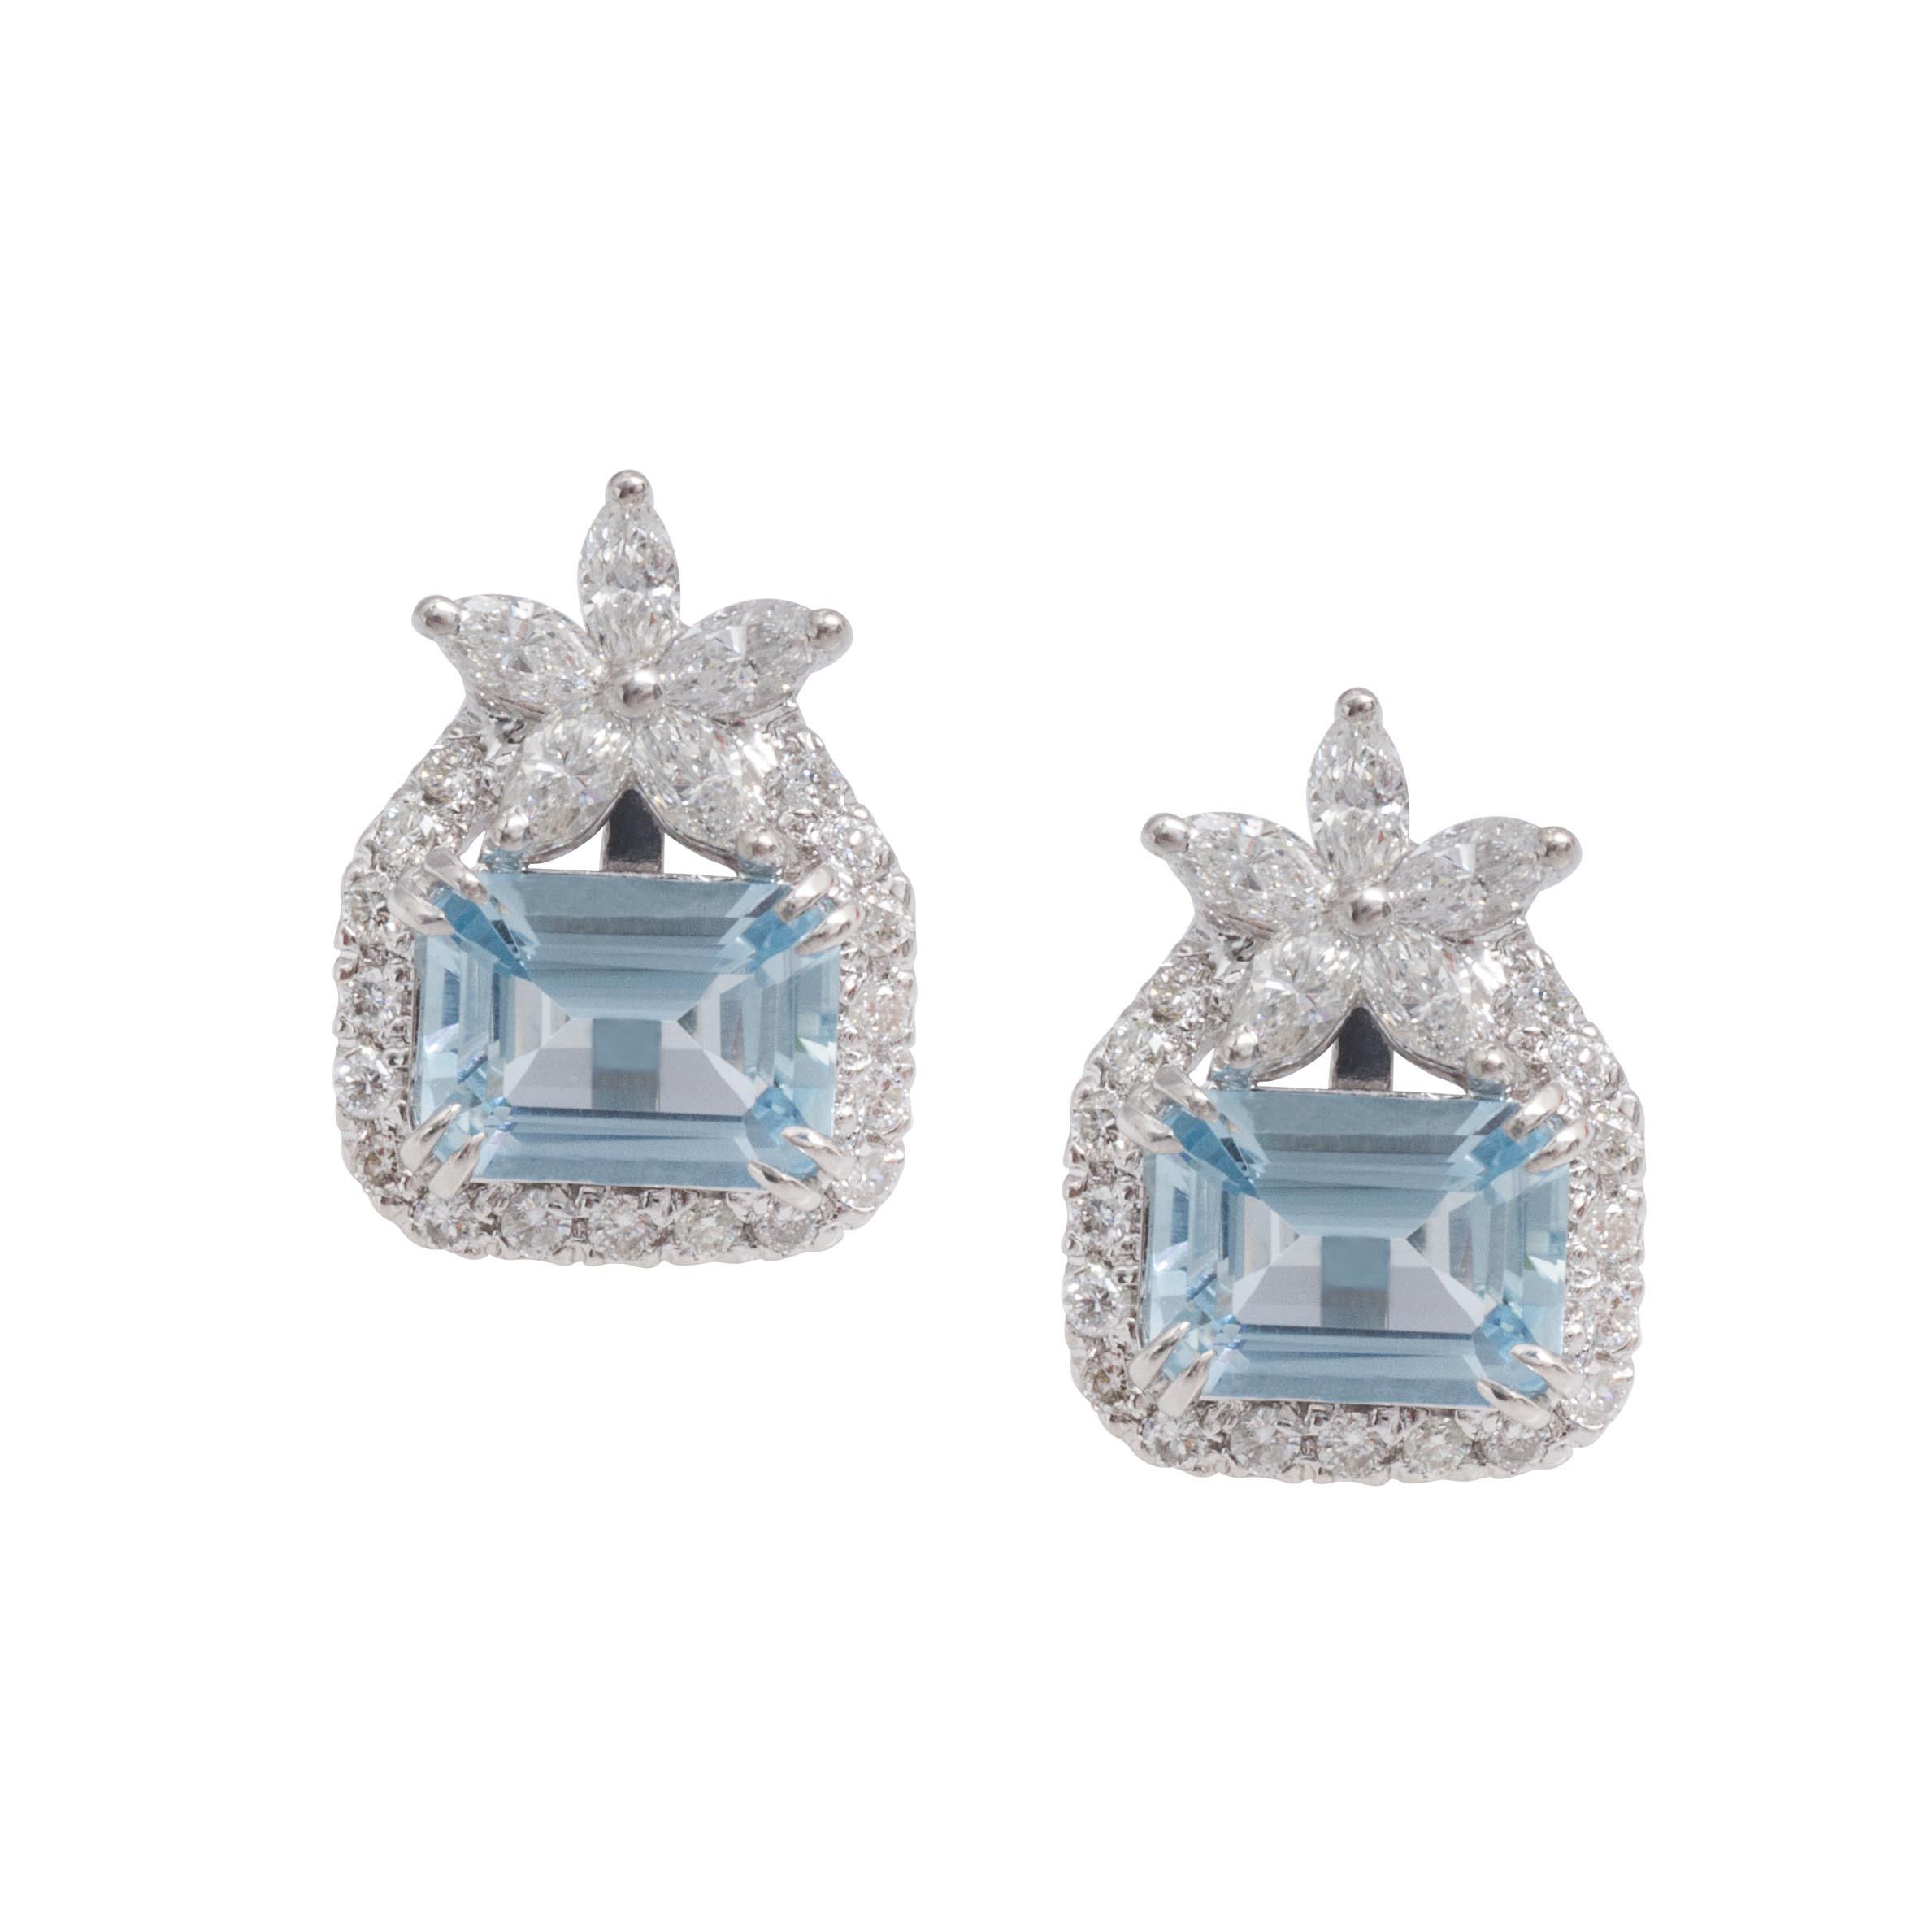 New 3.14 CTW Emerald & Diamond Halo Earrings